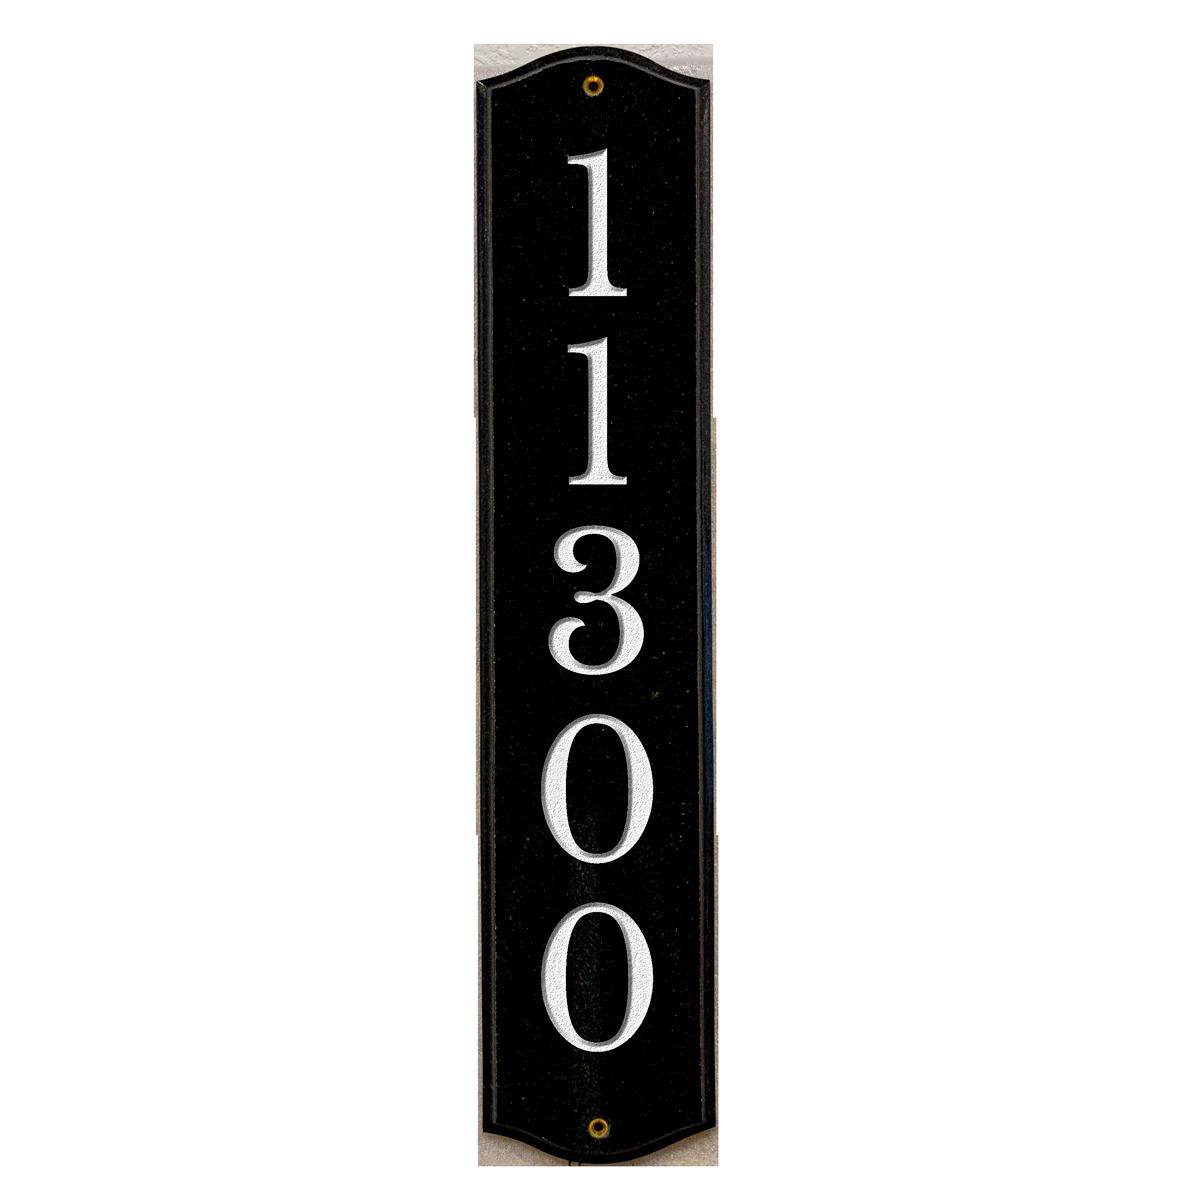 Engraved vertical plaque online